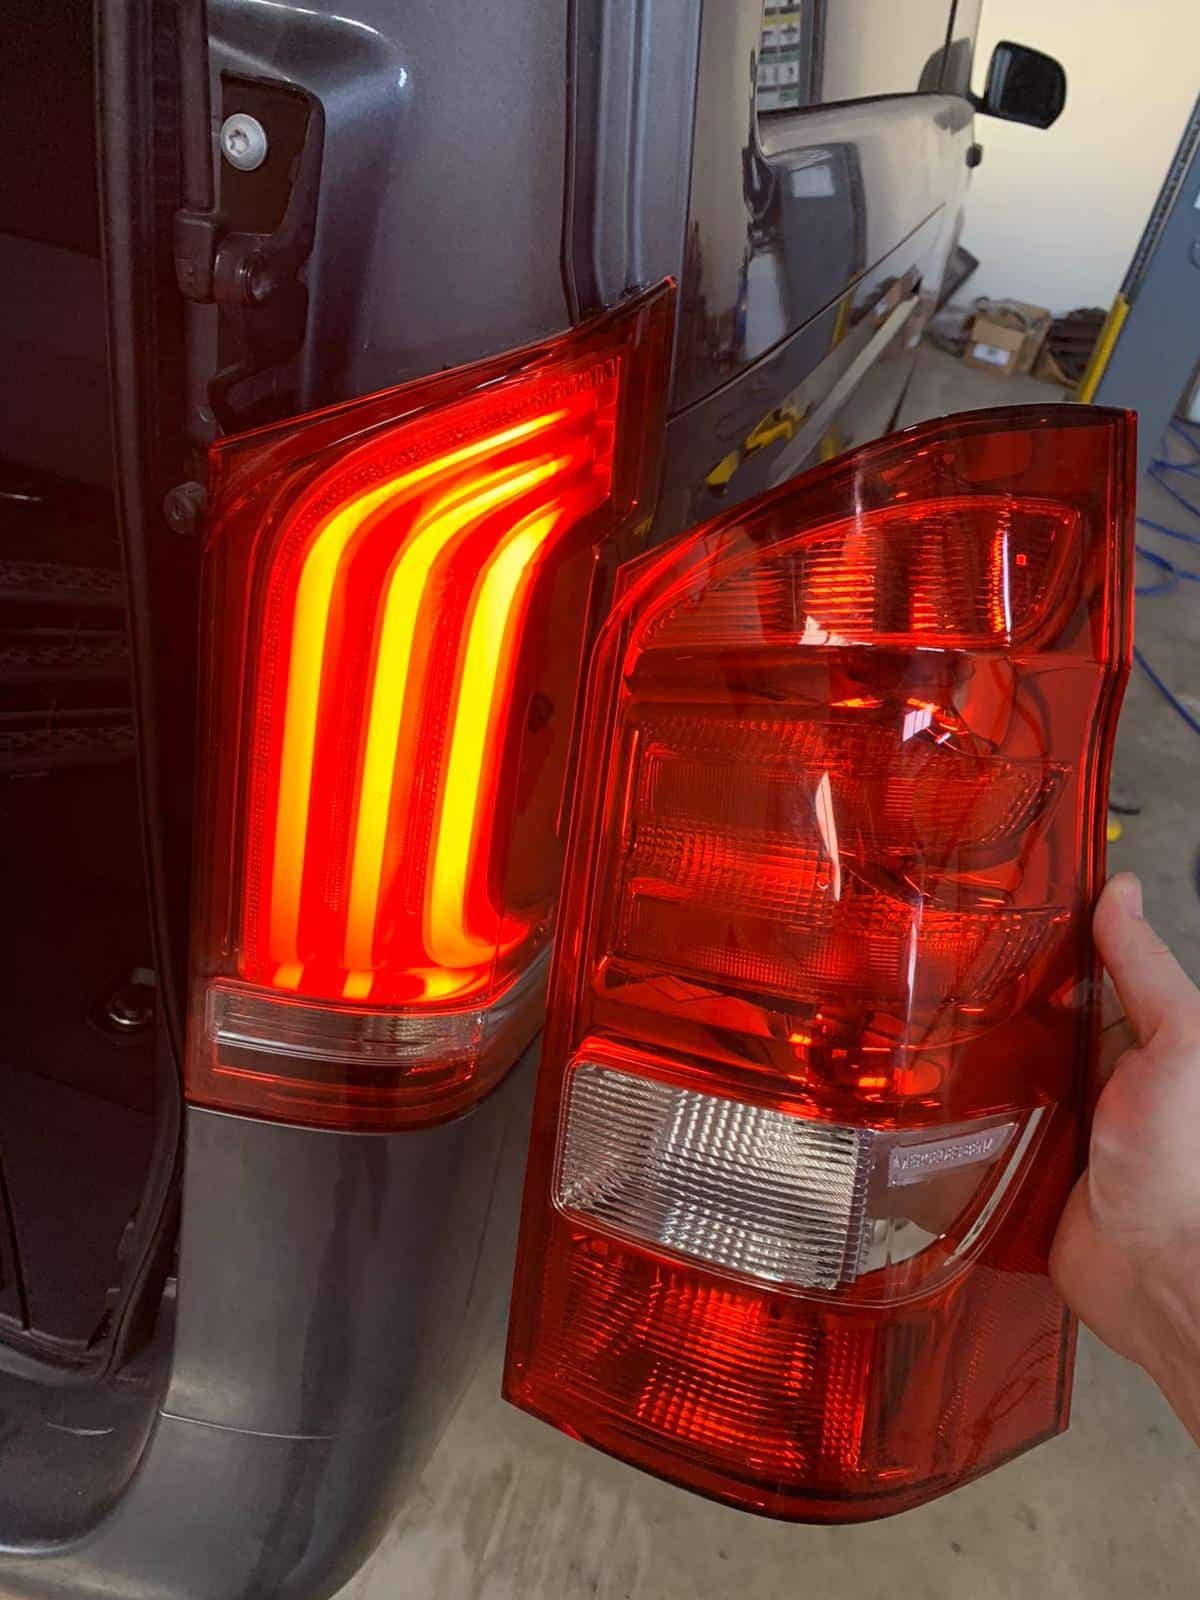 Mercedes Lighting upgrades